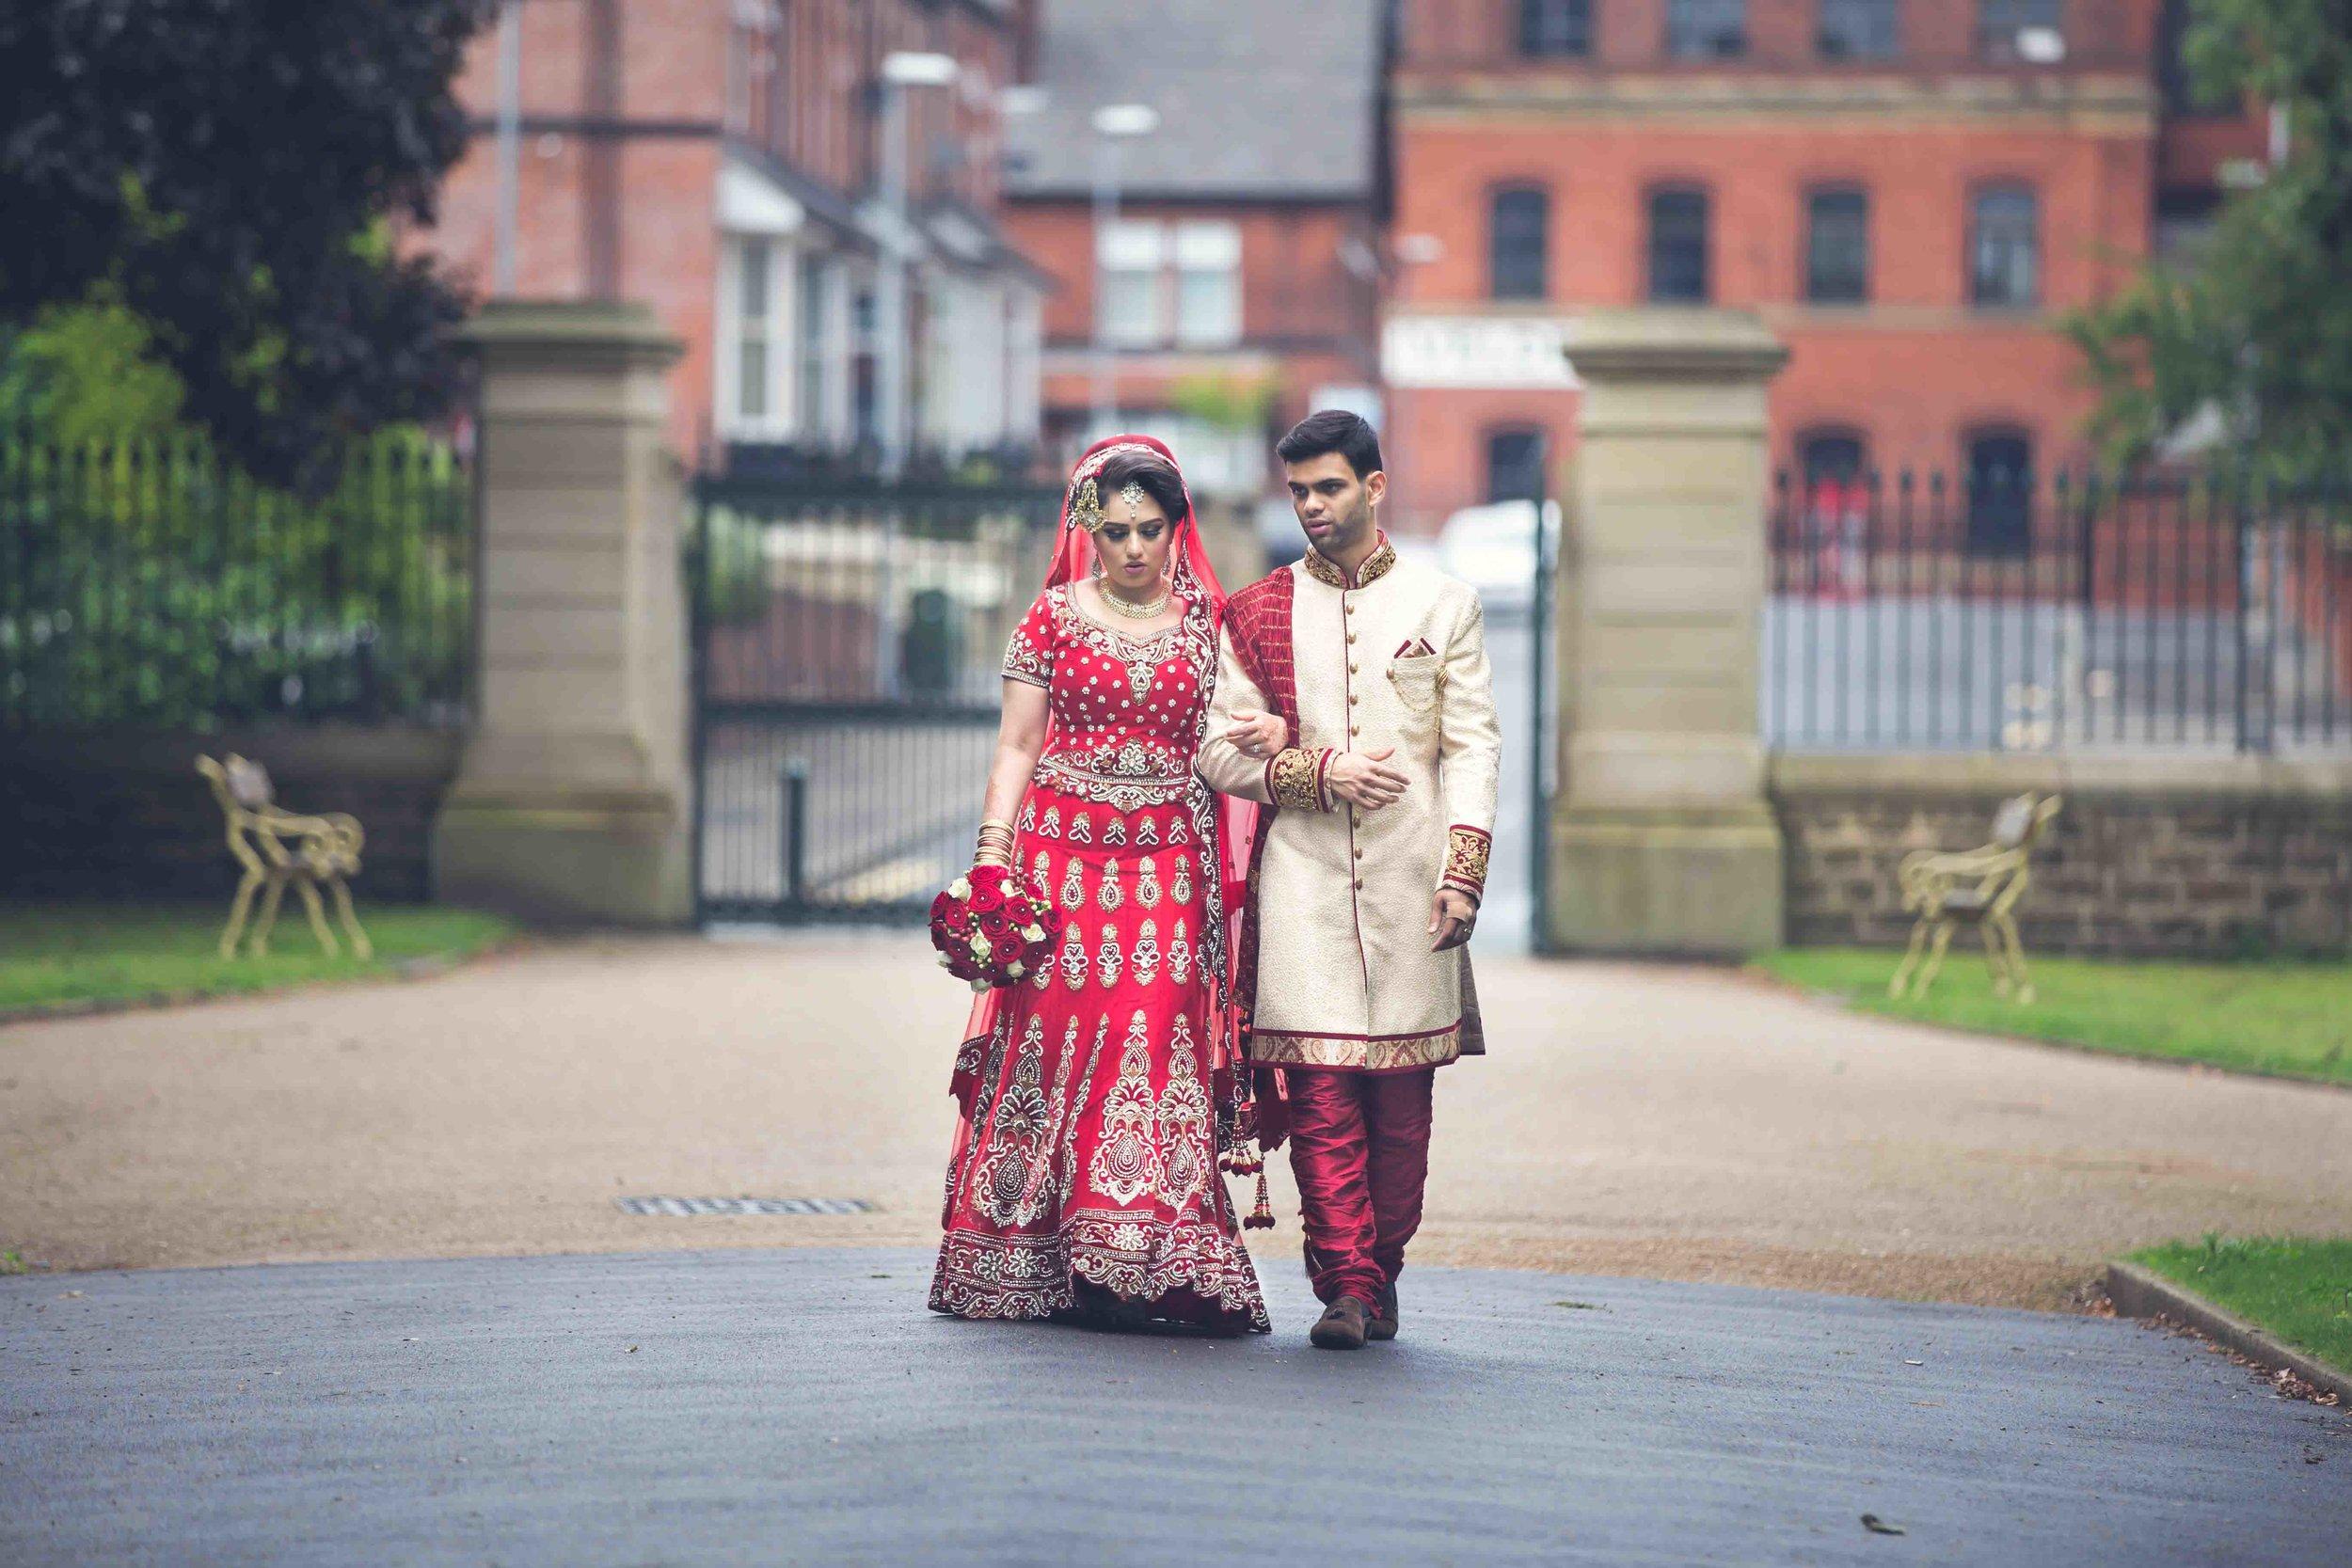 Asian Wedding Photographer Opu Sultan Photography Lyme Park Scotland Edinburgh Glasgow London Manchester Liverpool Birmingham Wedding Photos prewed shoot Jams & Tams Blod-24.jpg